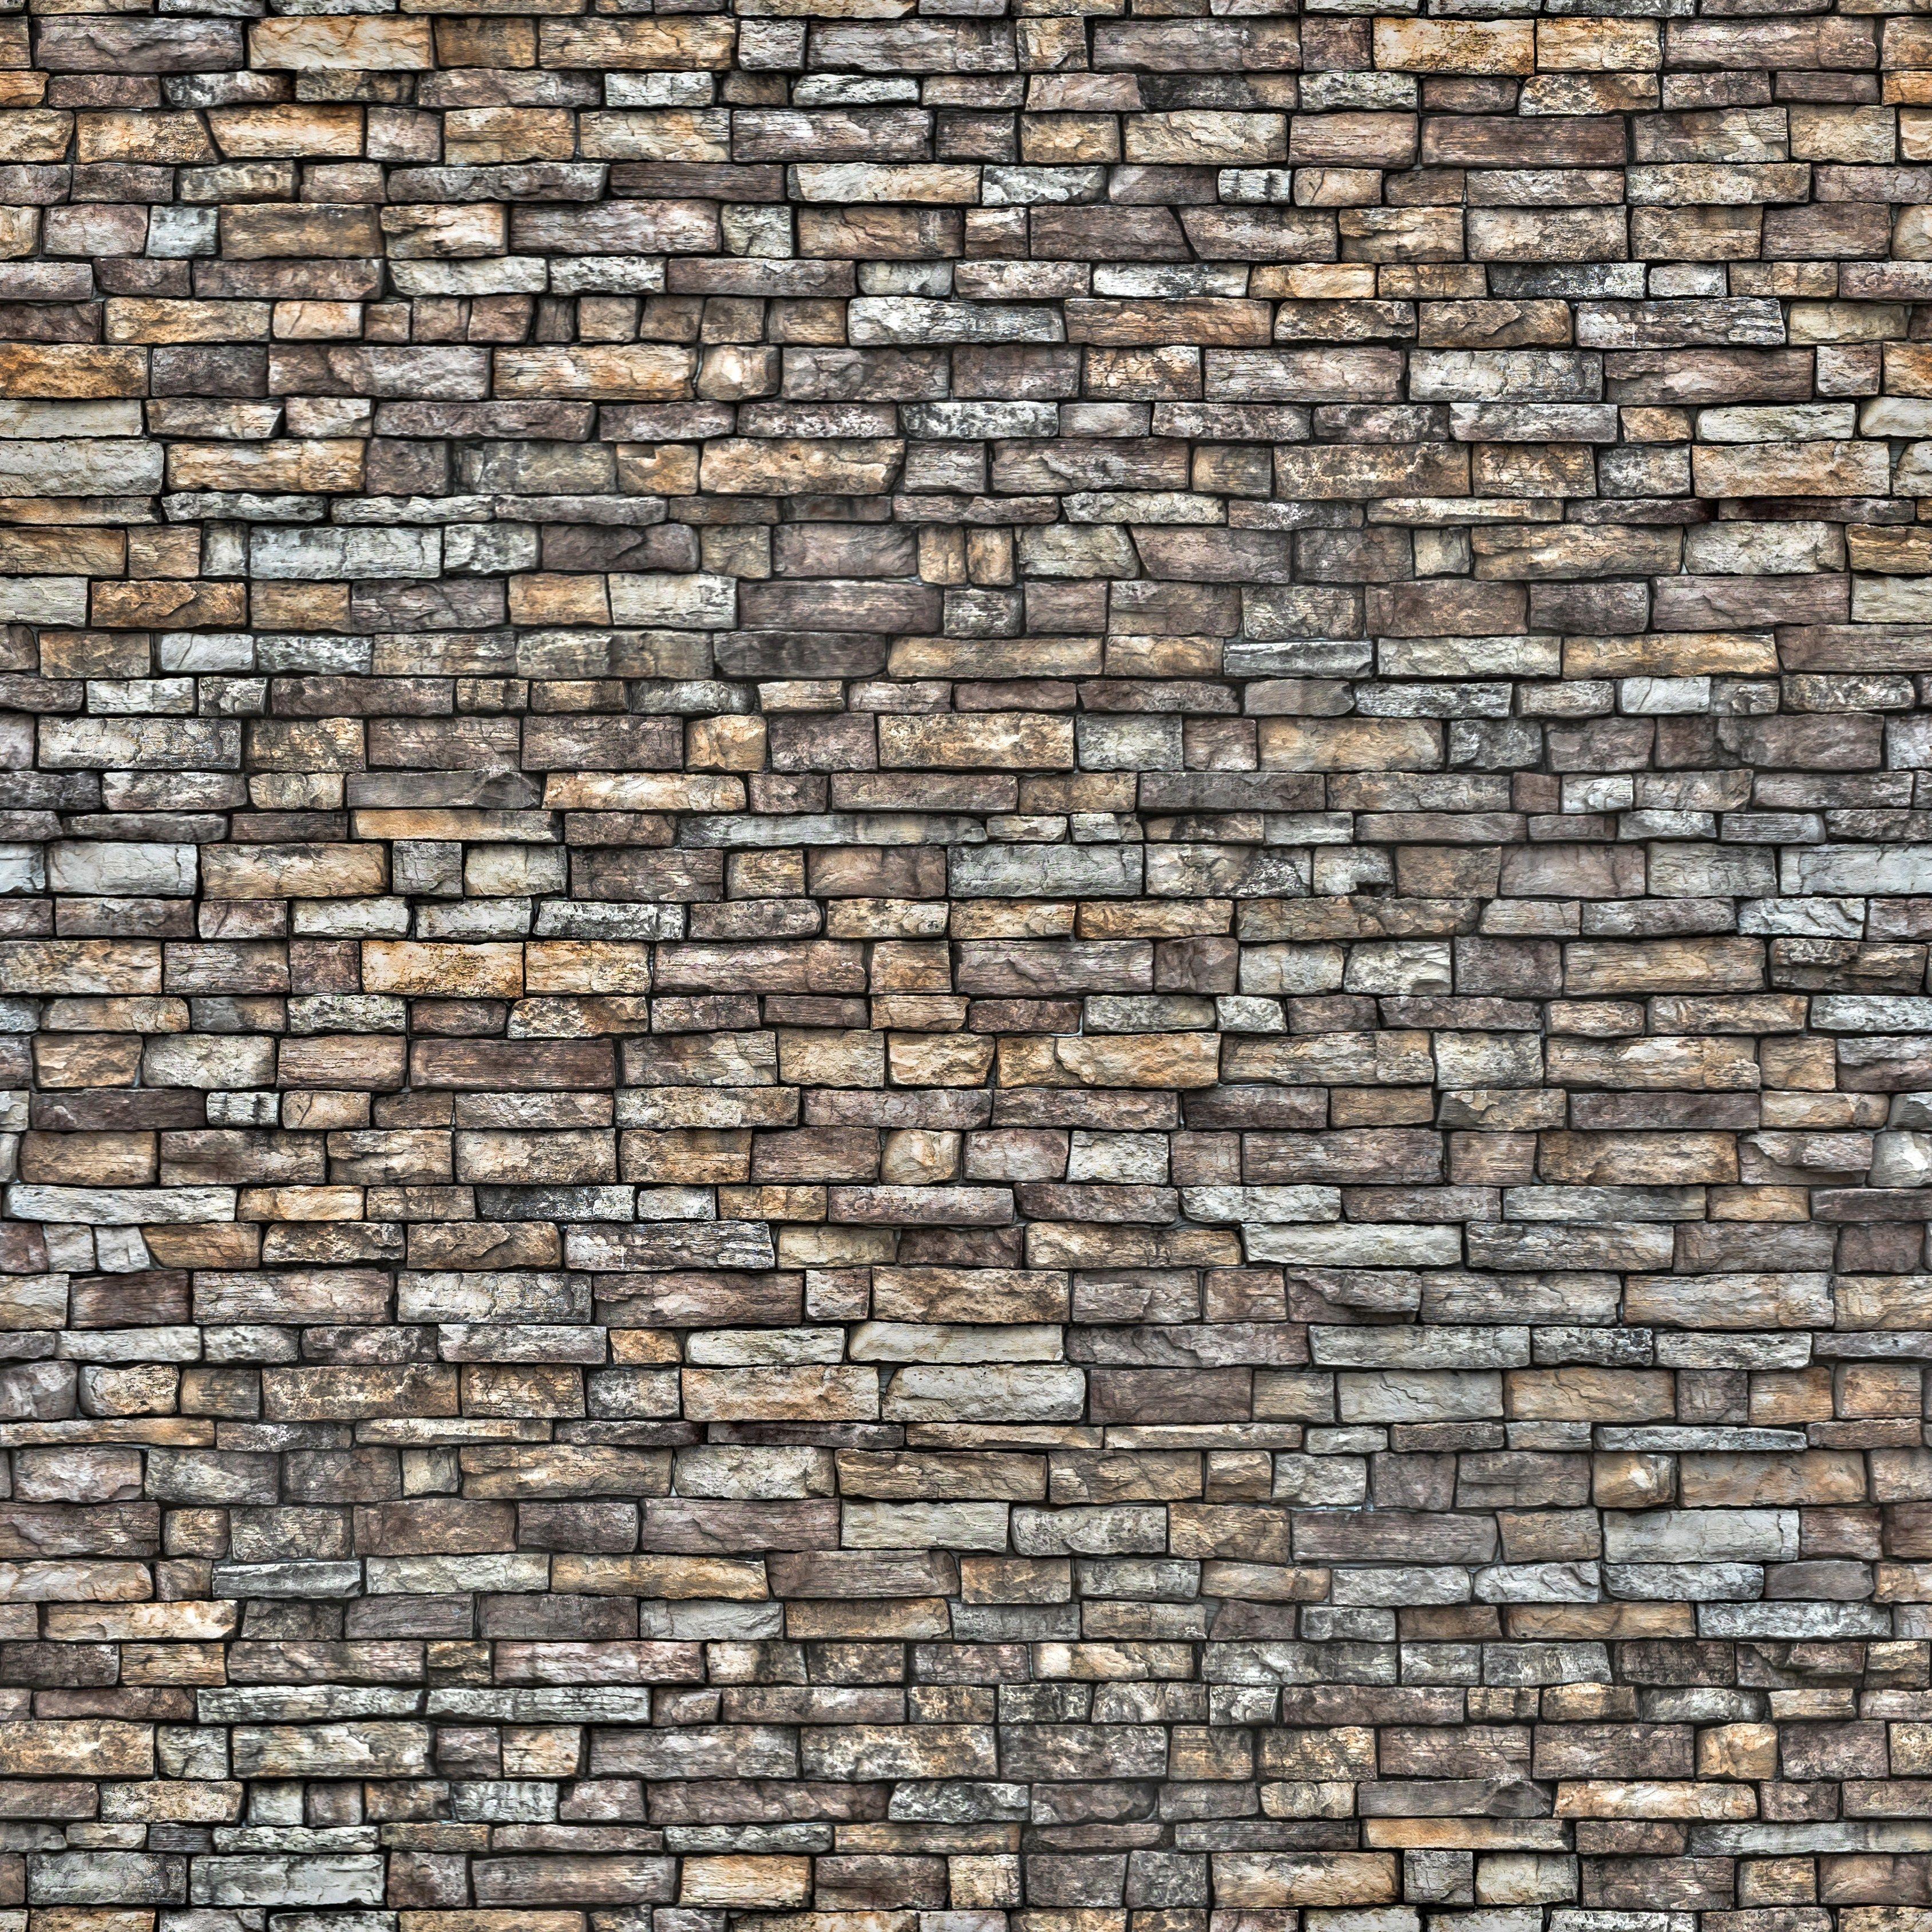 Warm Rectangular Stone Wall Stone Wall Backdrop Stone Wall